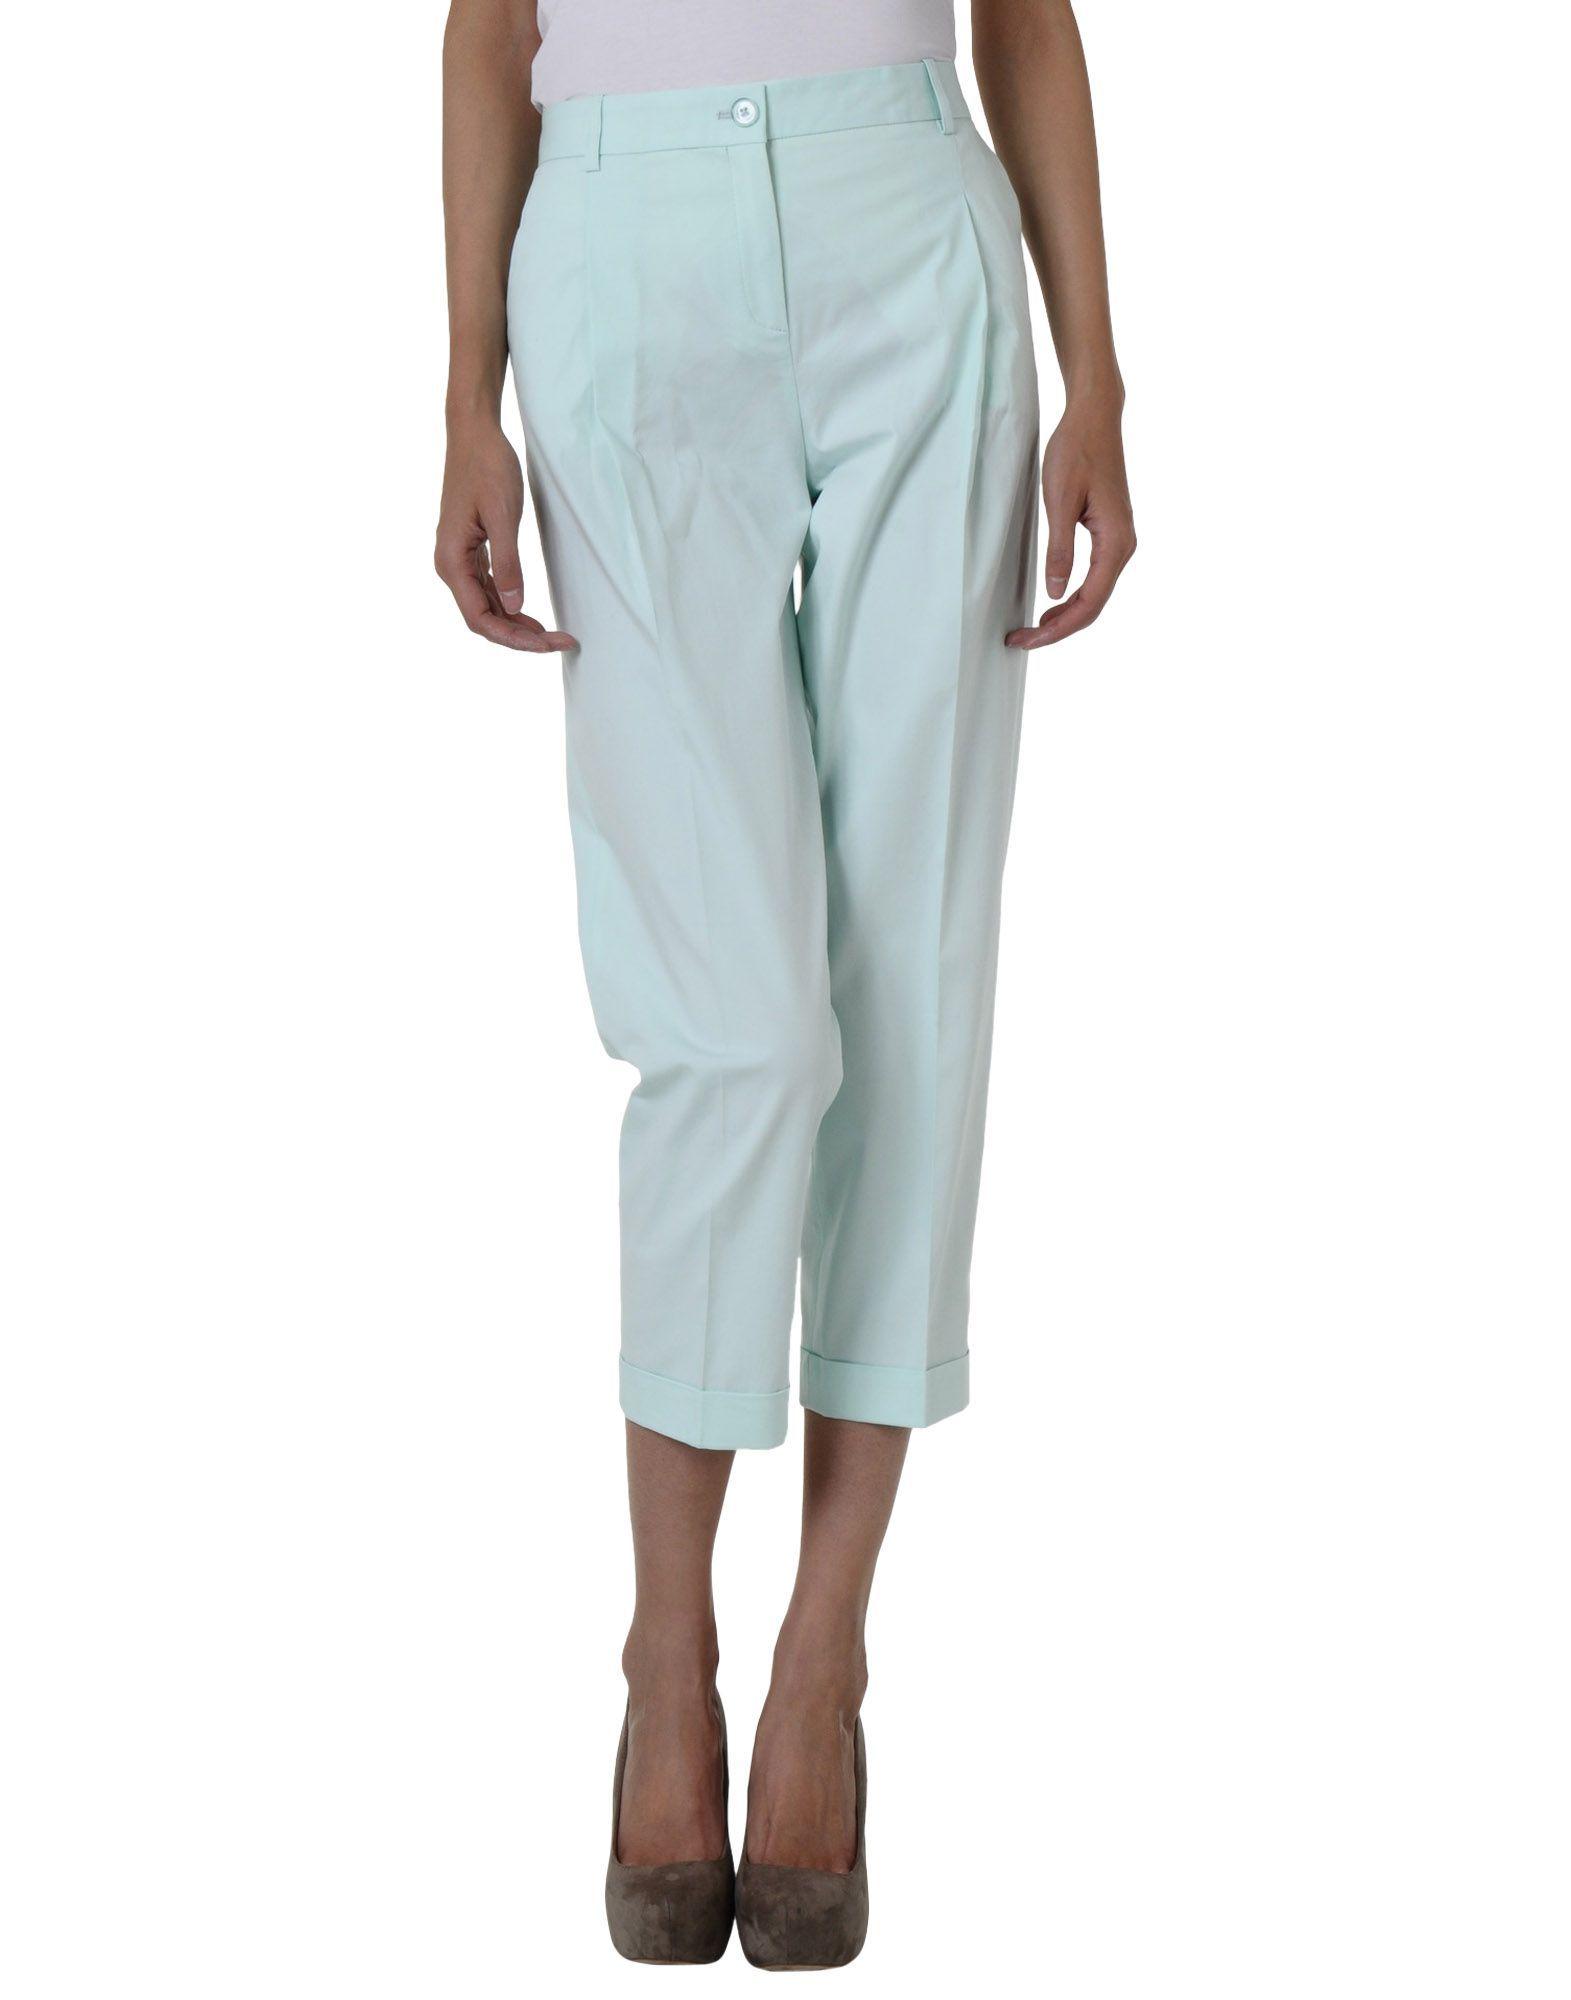 Pantalone Capri Jil Sander Navy Uomo - Acquista online su YOOX - 36594233WO